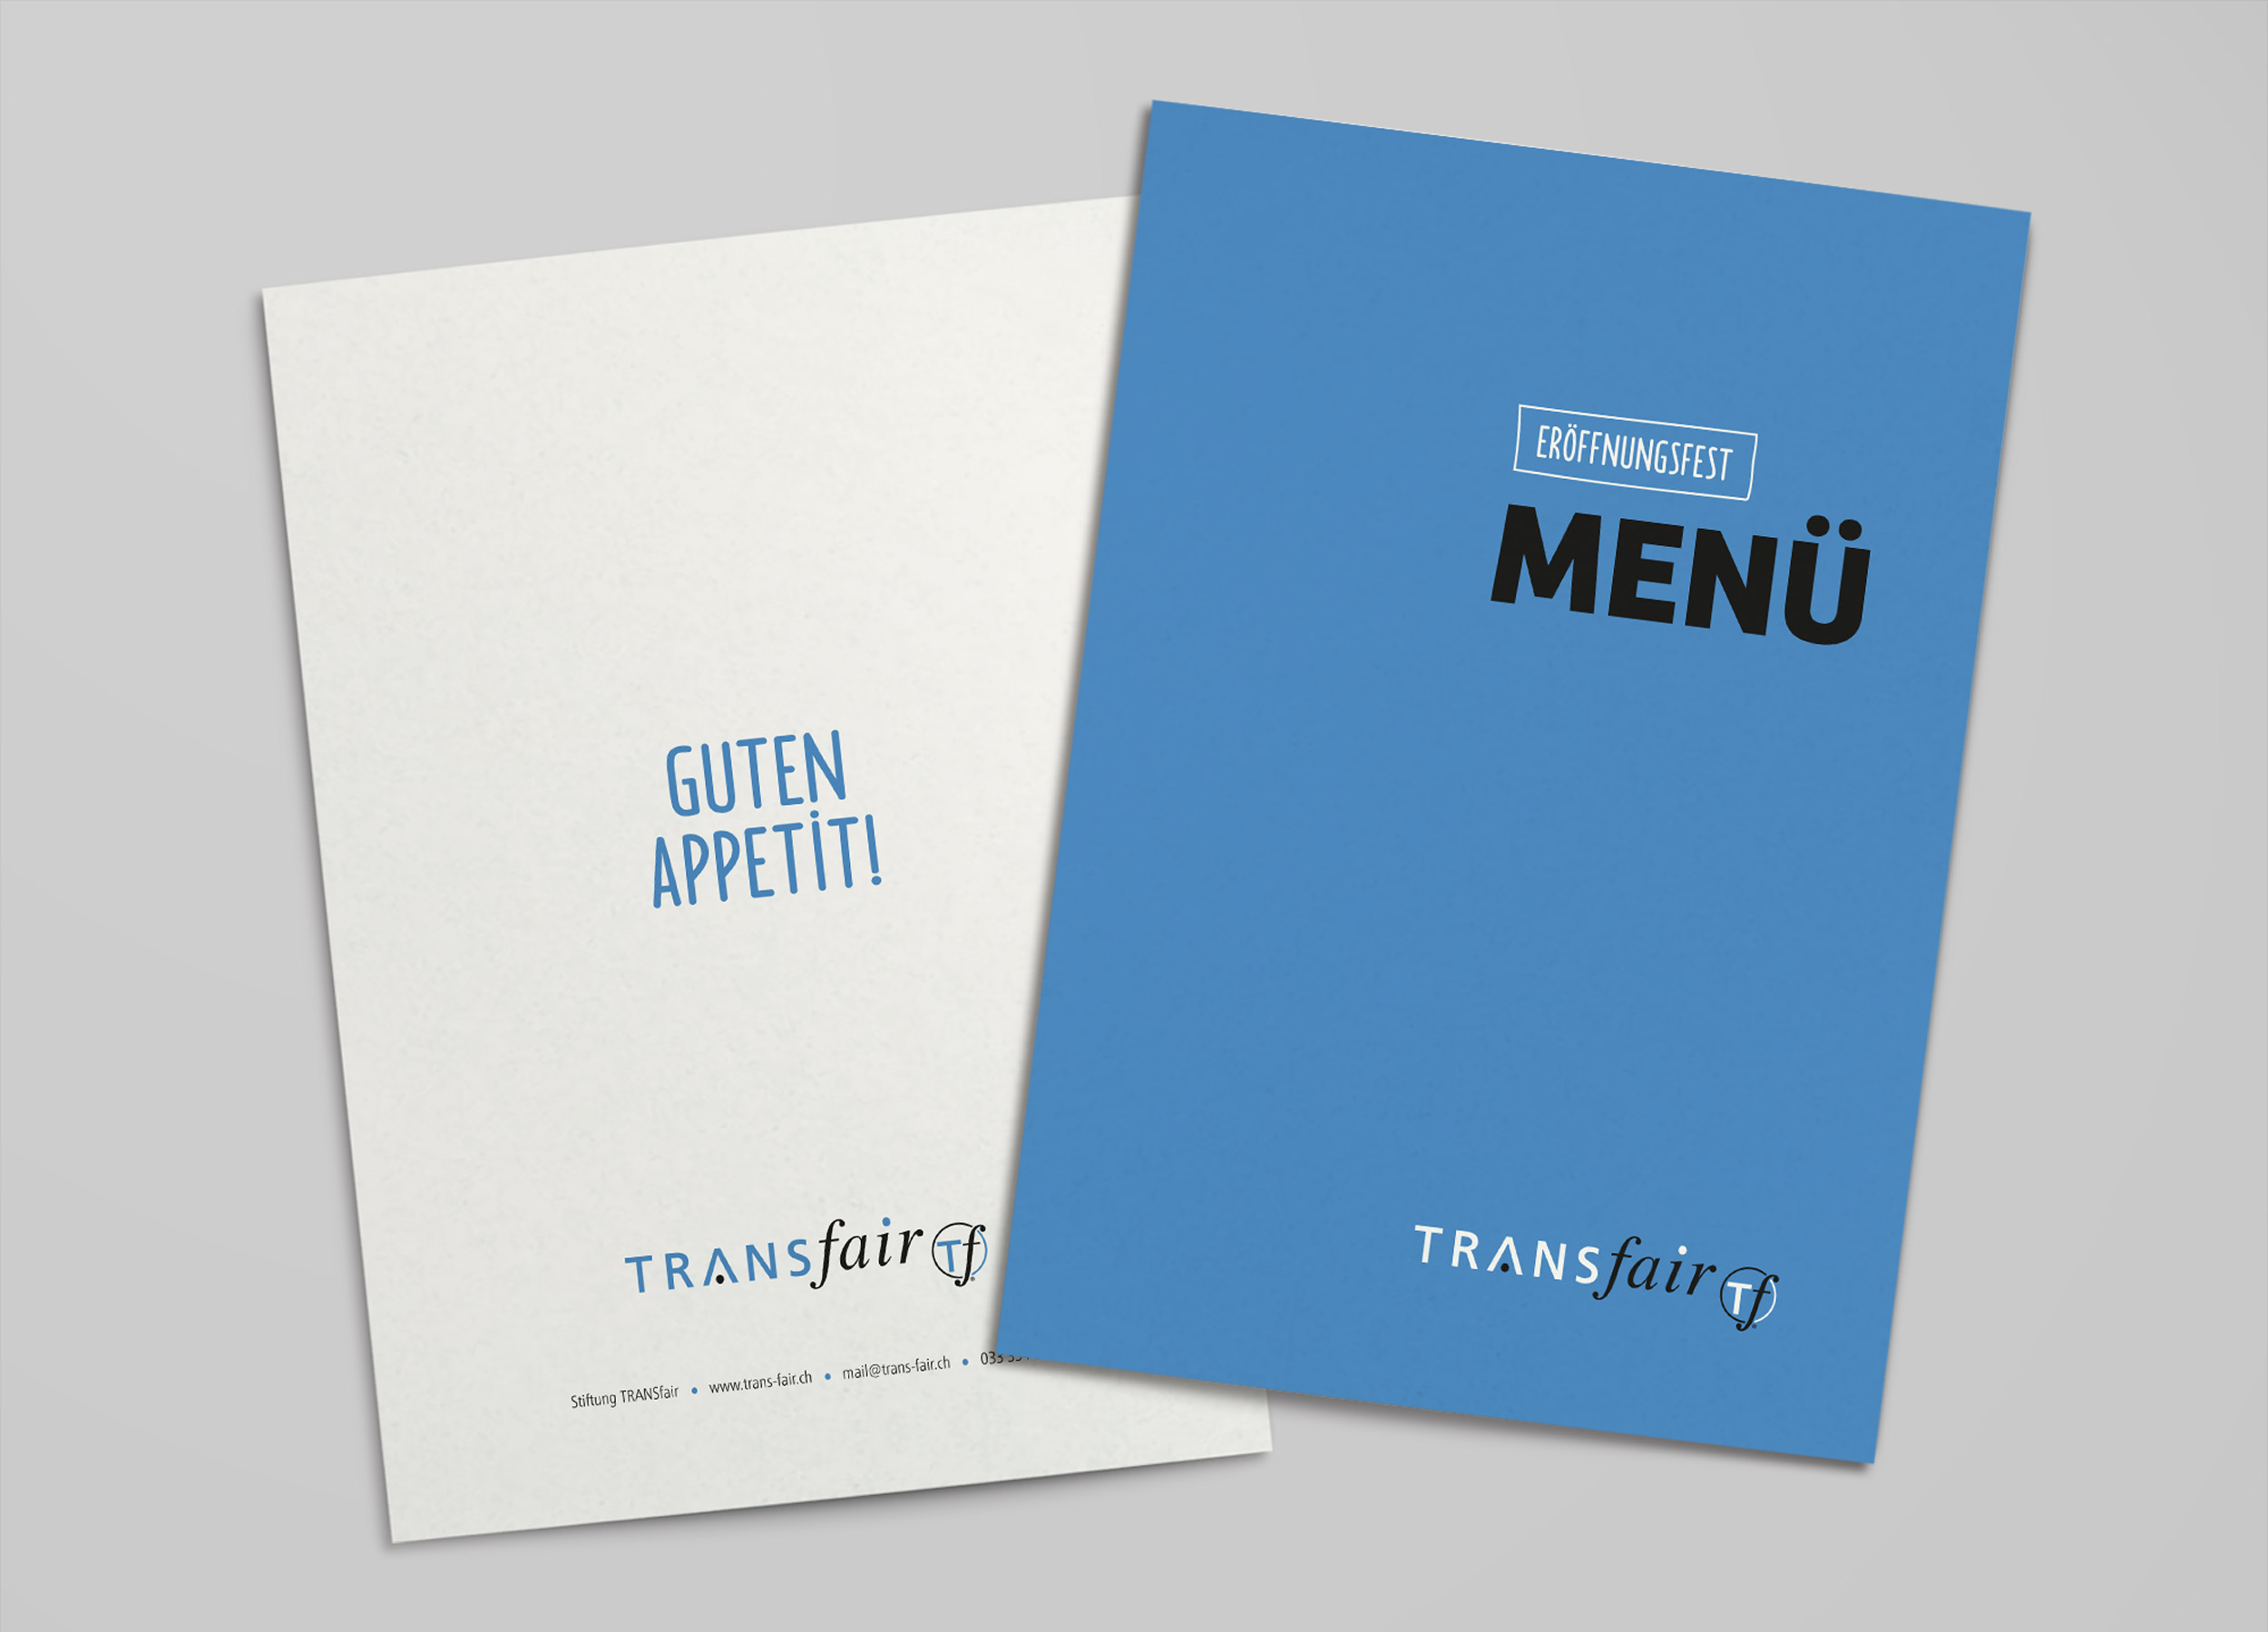 Foundation TRANSfair menu GPU Desiagn